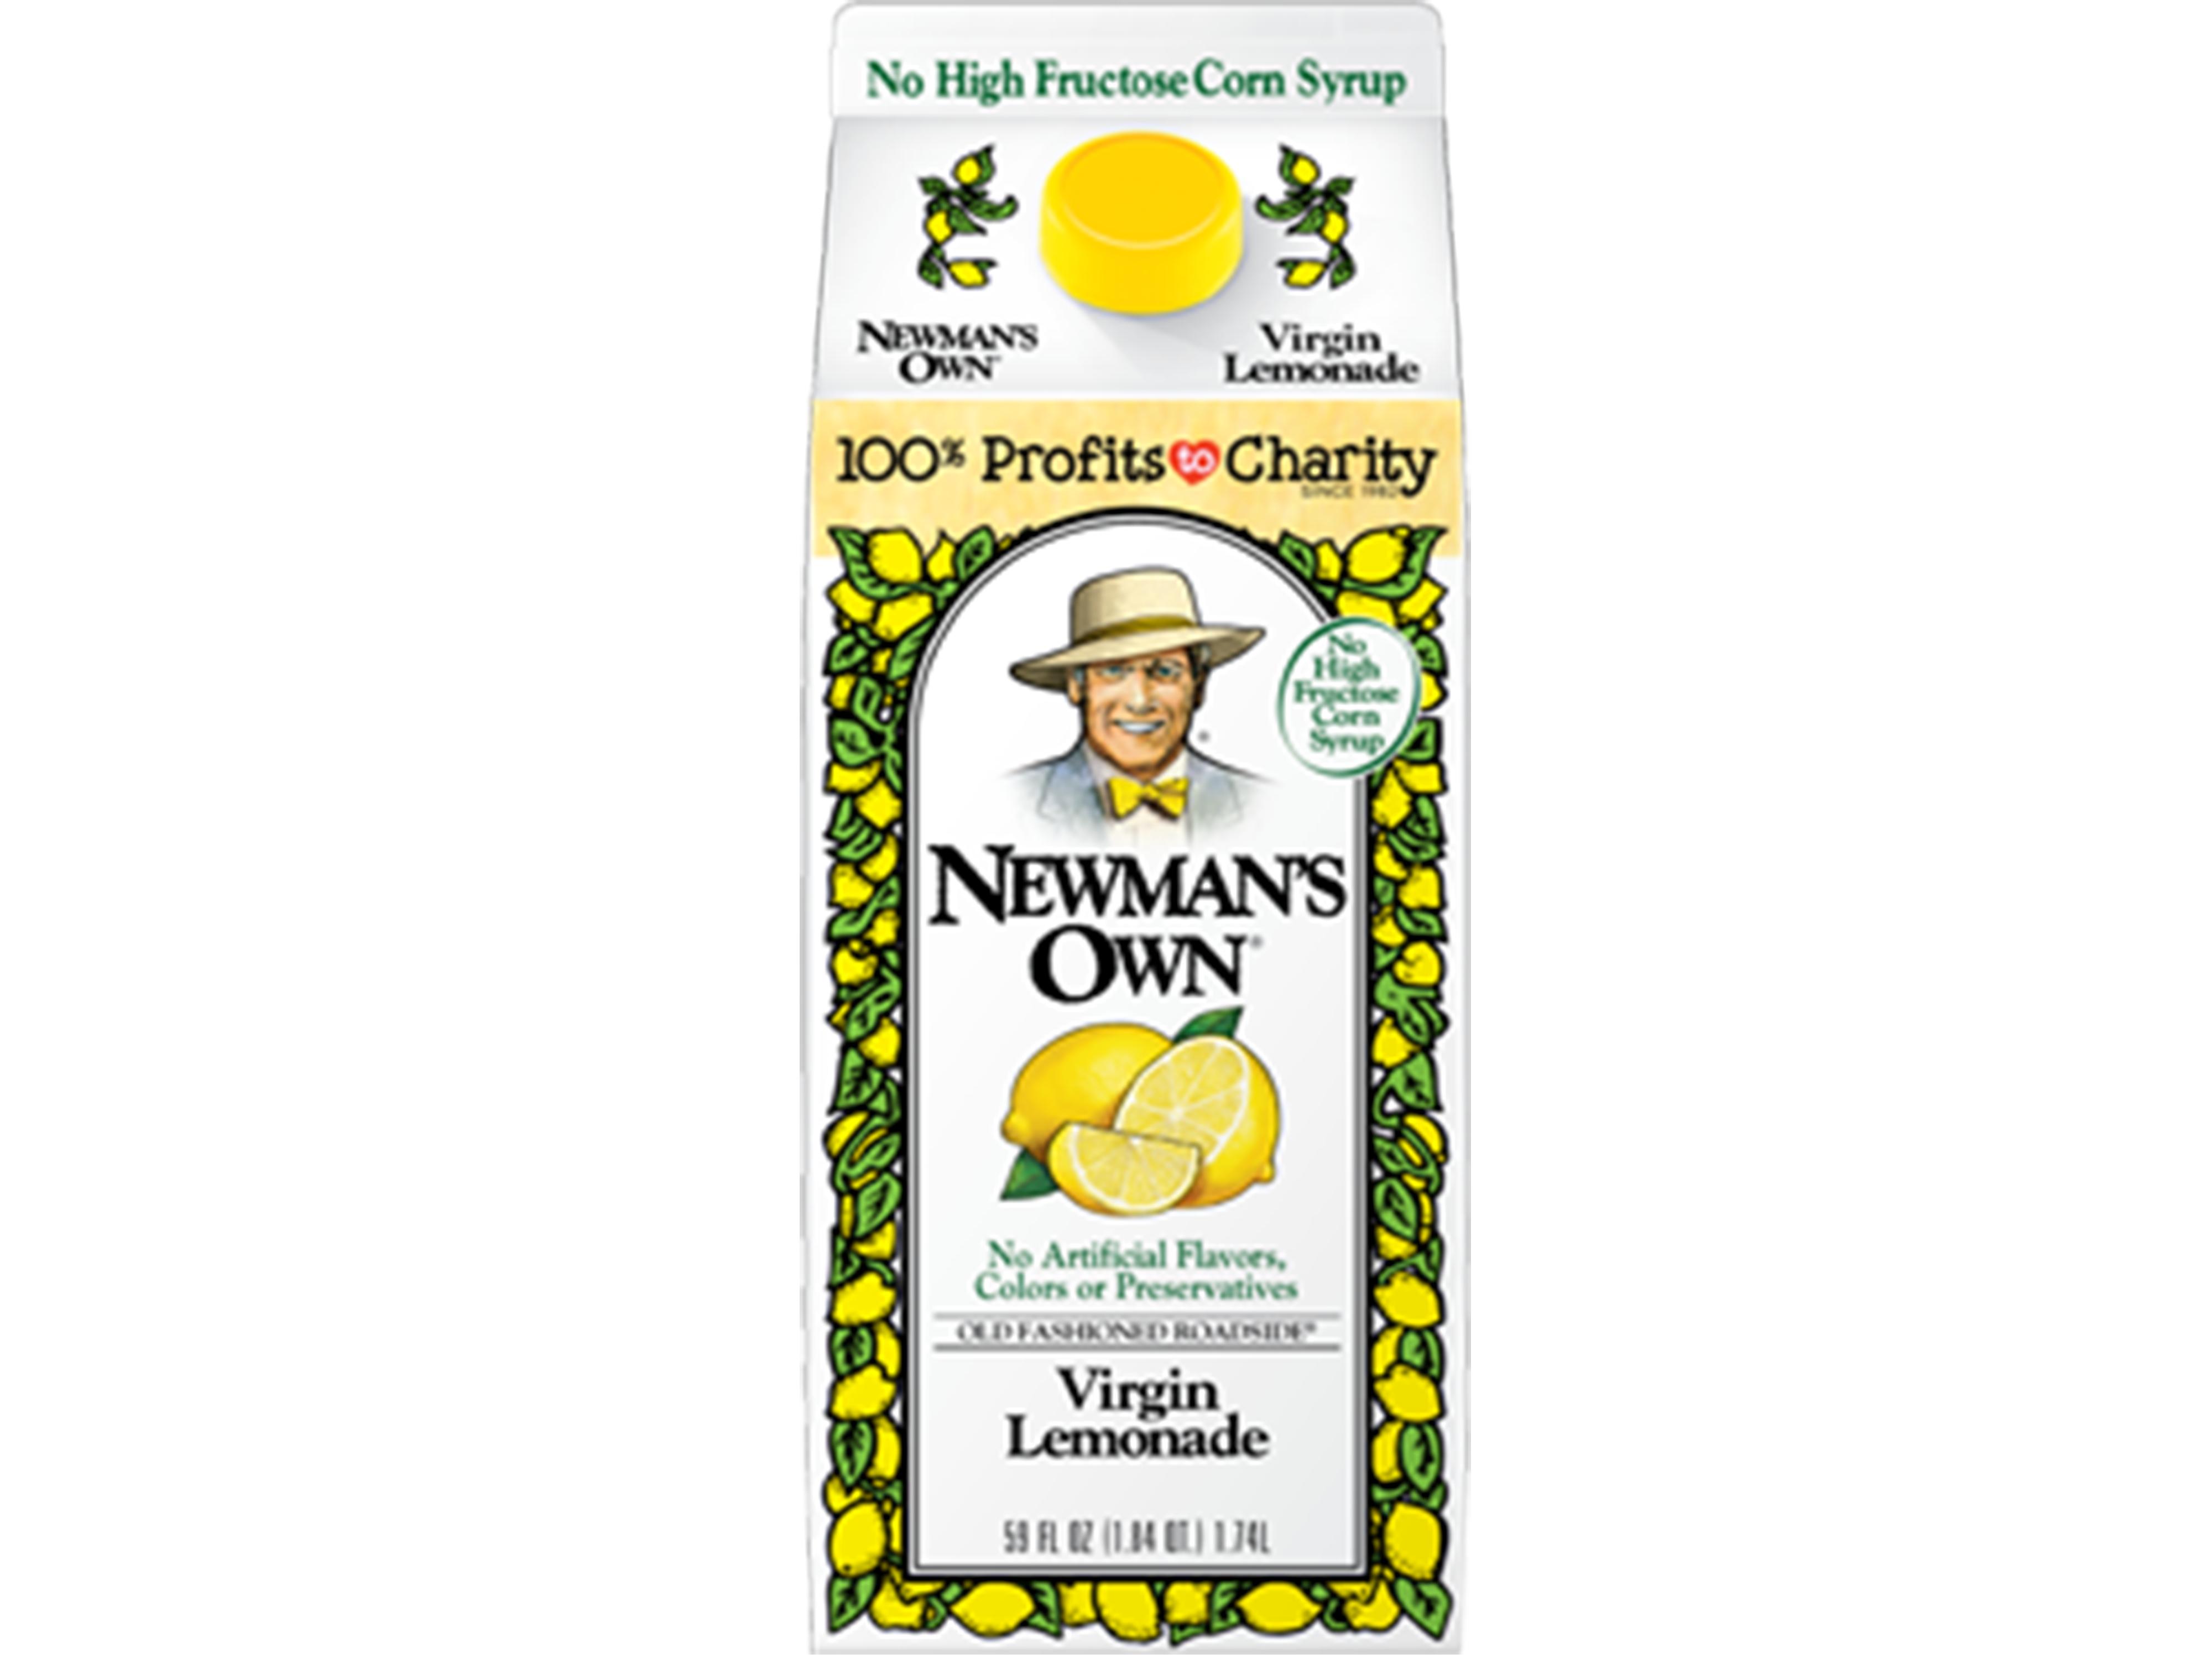 newmans-lemonade